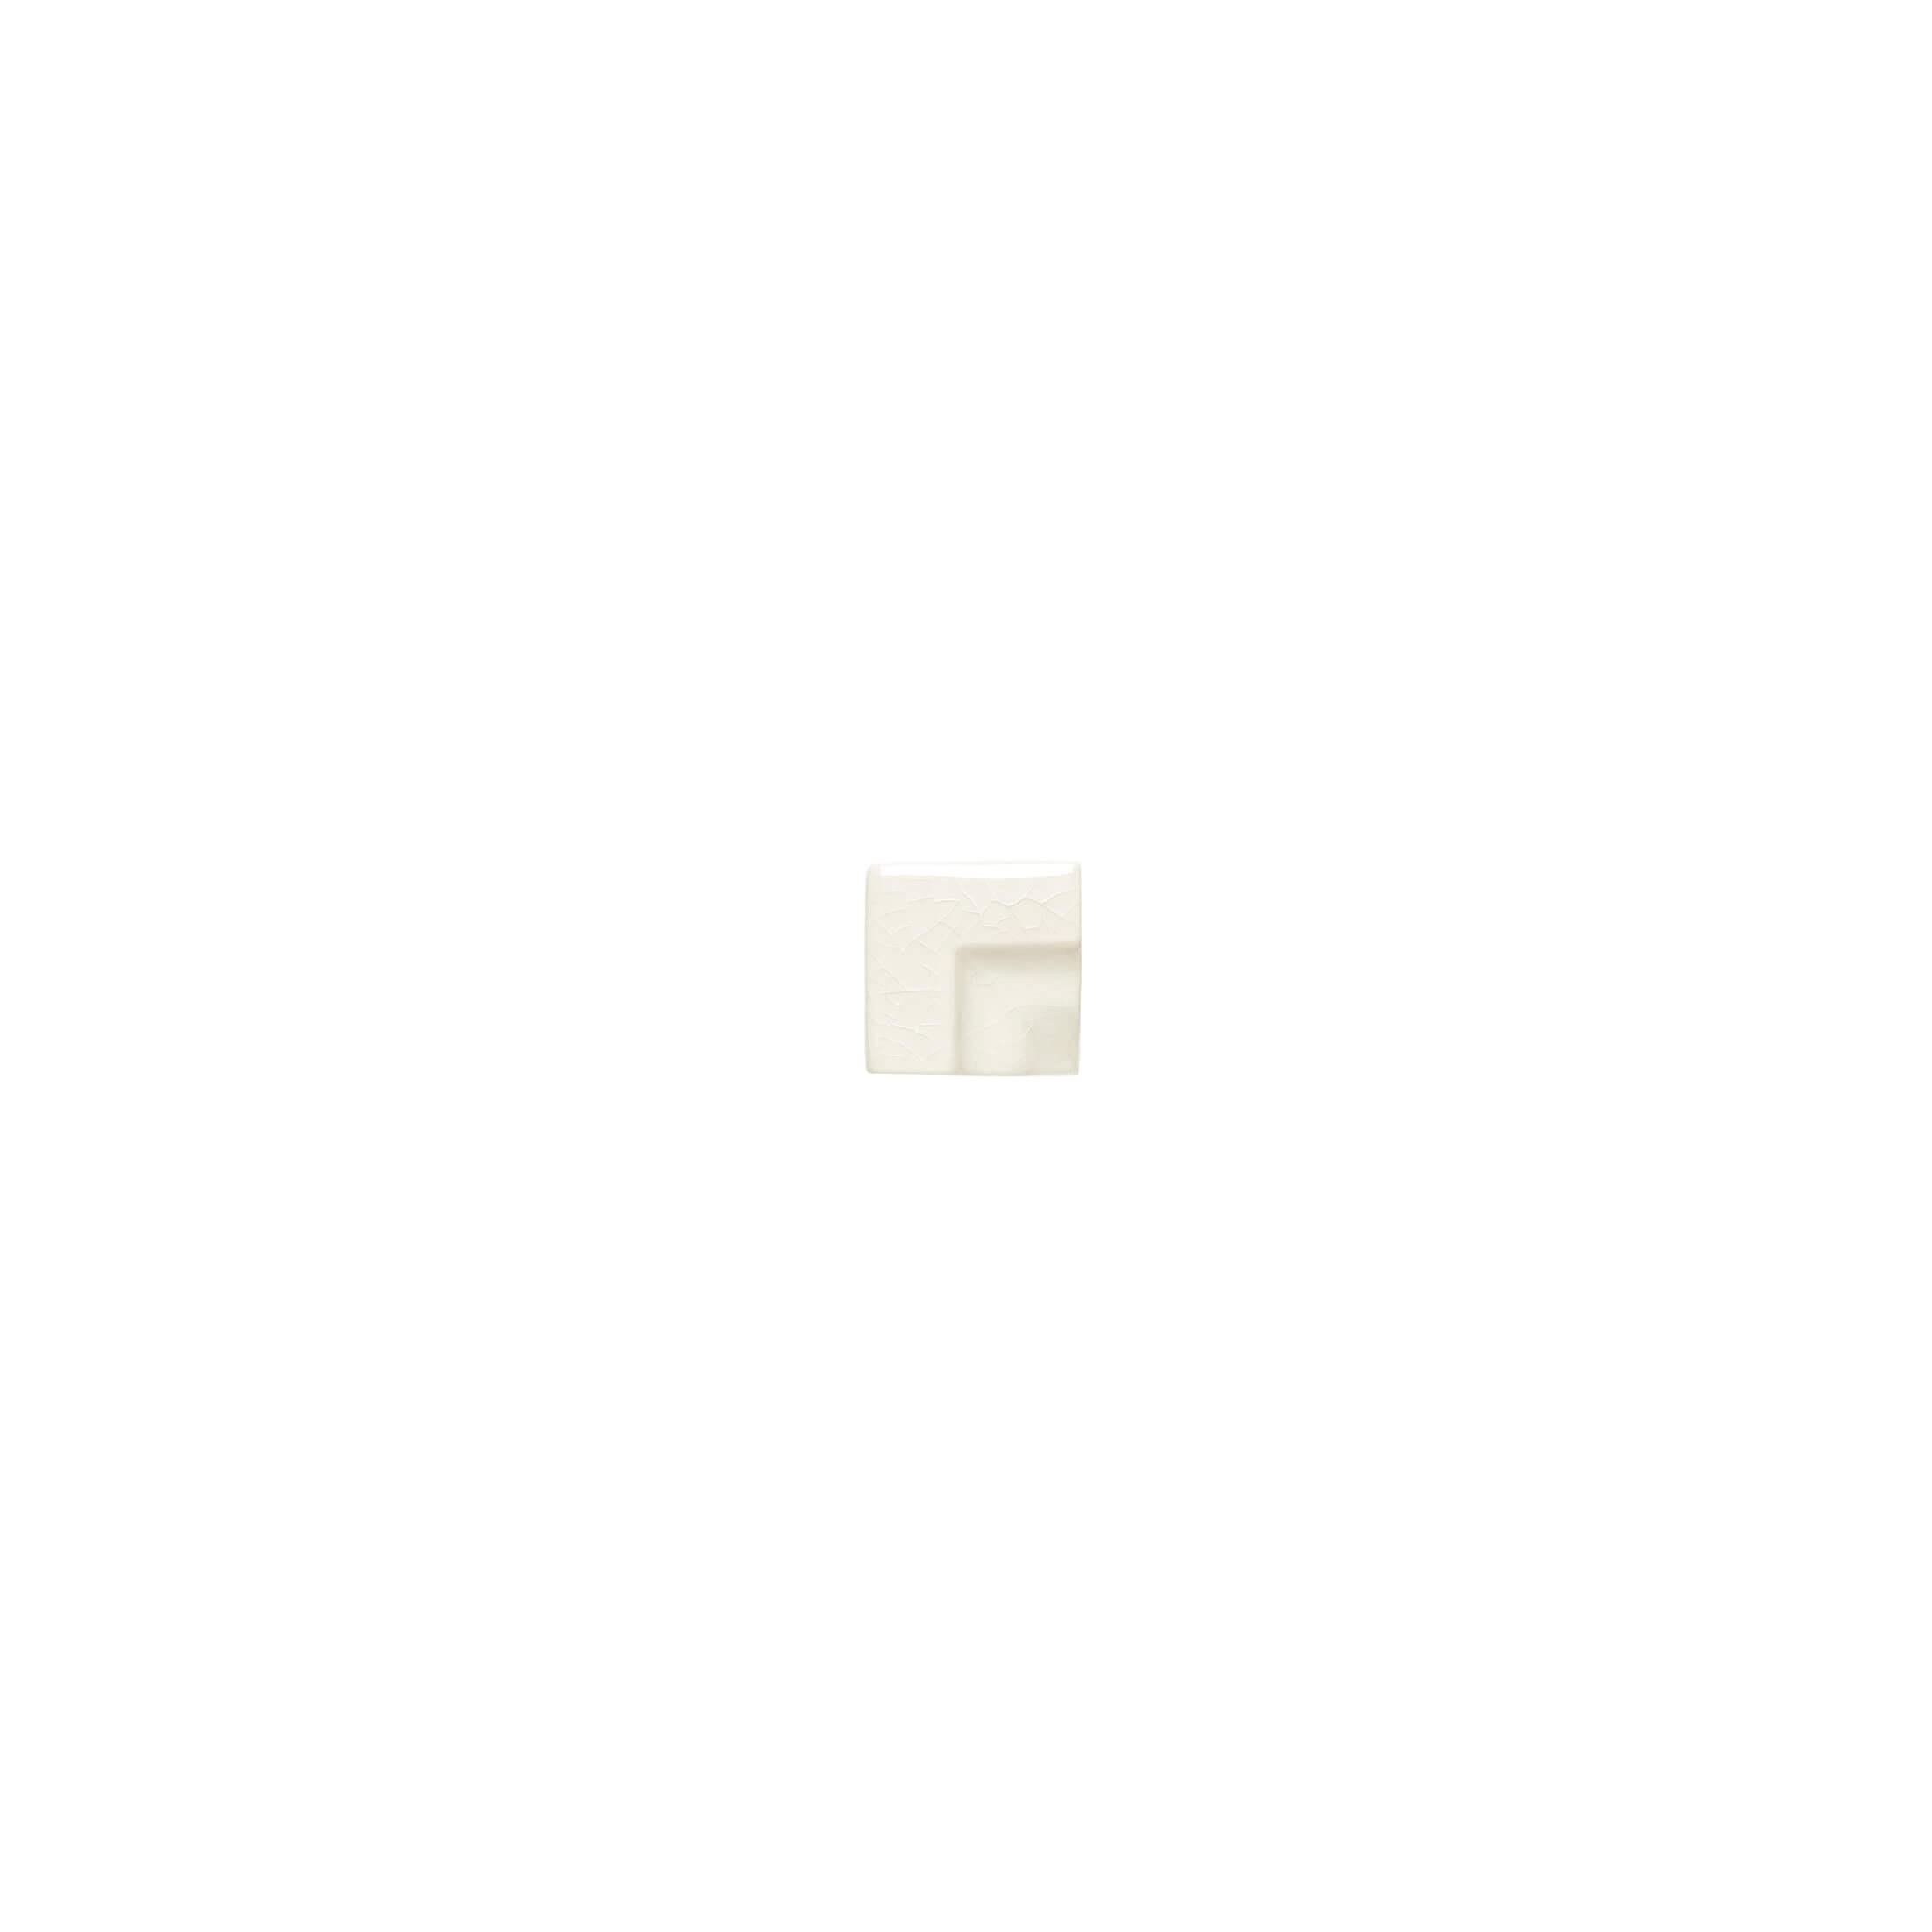 ADEX-ADMO5402-ANGULO-MARCO CORNISA CLASICA C/C -3.5 cm-15 cm-MODERNISTA>MARFIL